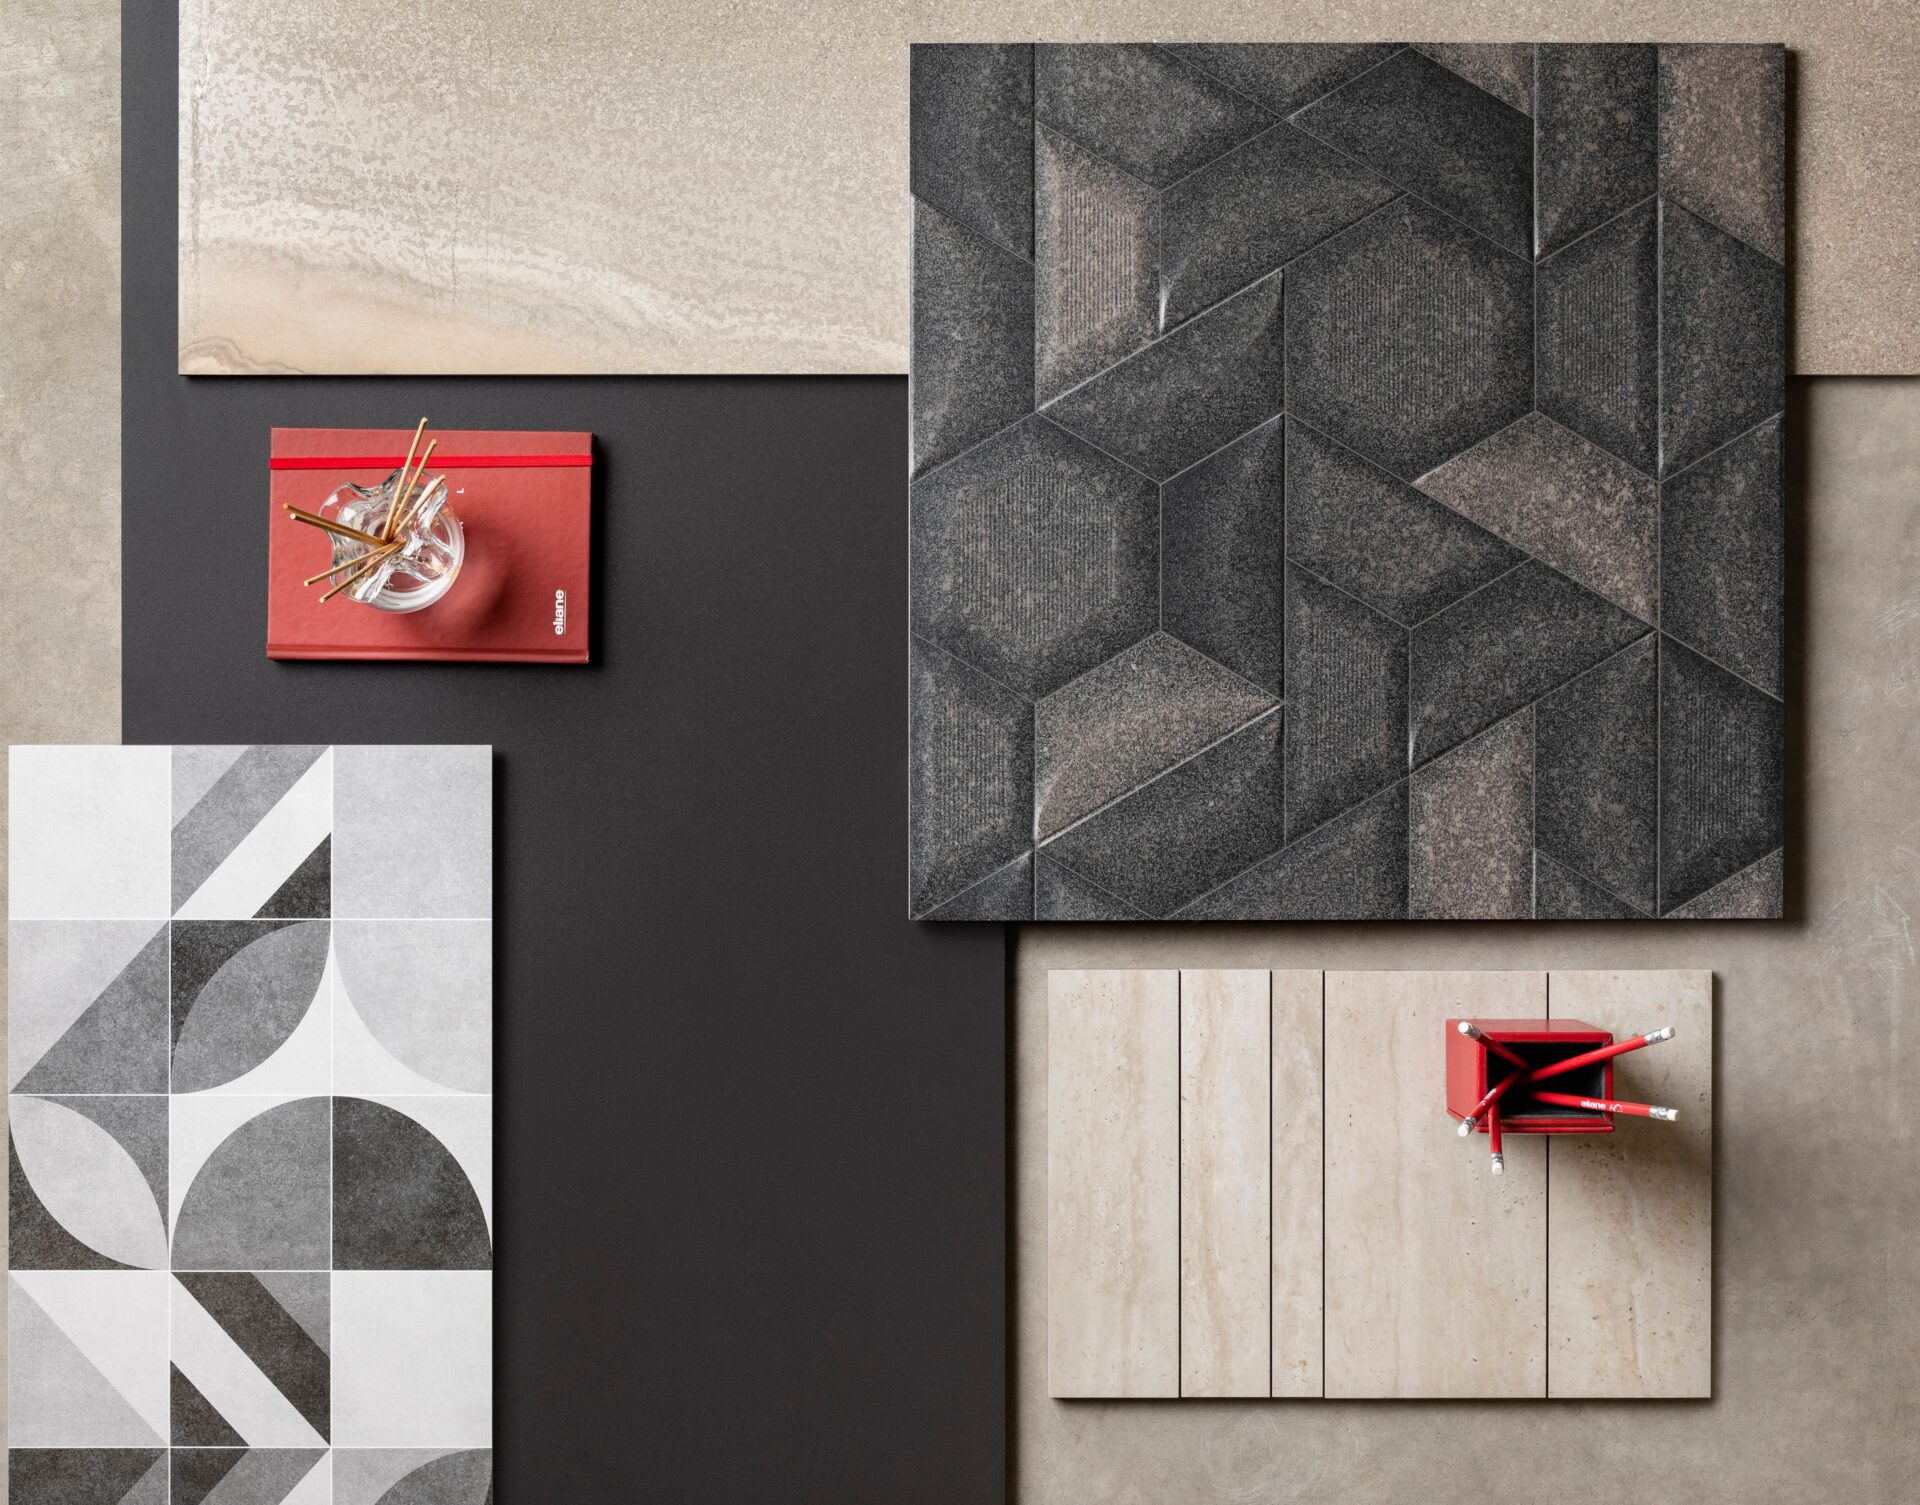 Trapezoid graphite 59x59cm | Malaga AC 32,5x59cm | Venus Bege AC 59X118,2m | Stelar Black NA 59×118,2cm | Delphi Ivory AC 29x45cm